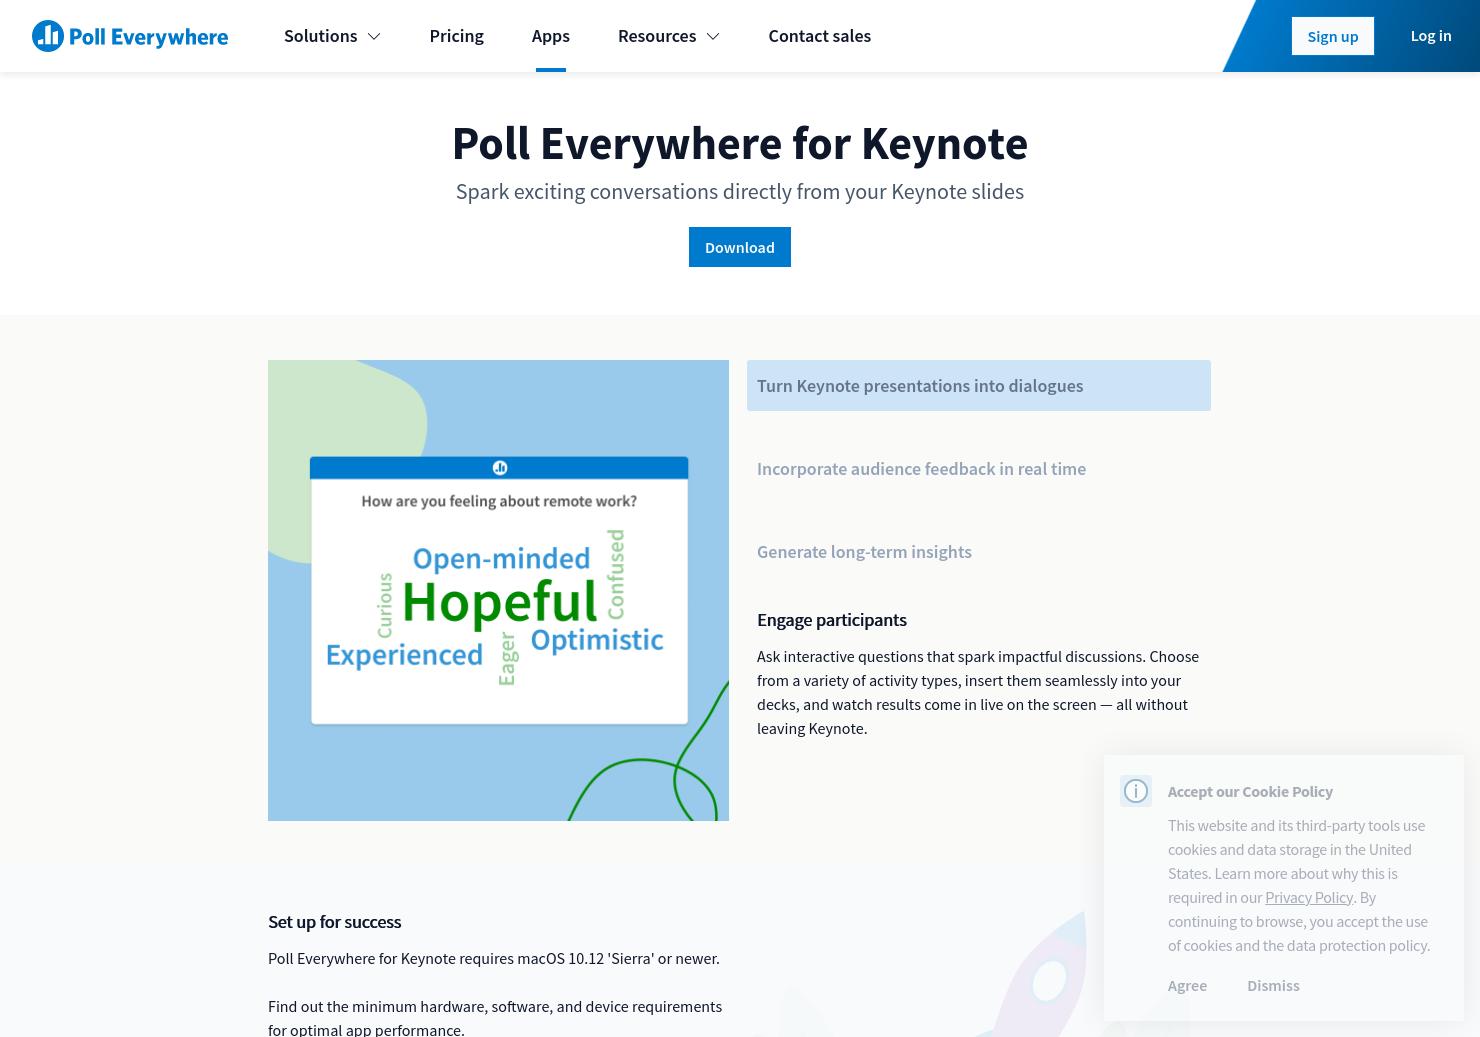 Poll Everywhere for Keynote | Poll Everywhere